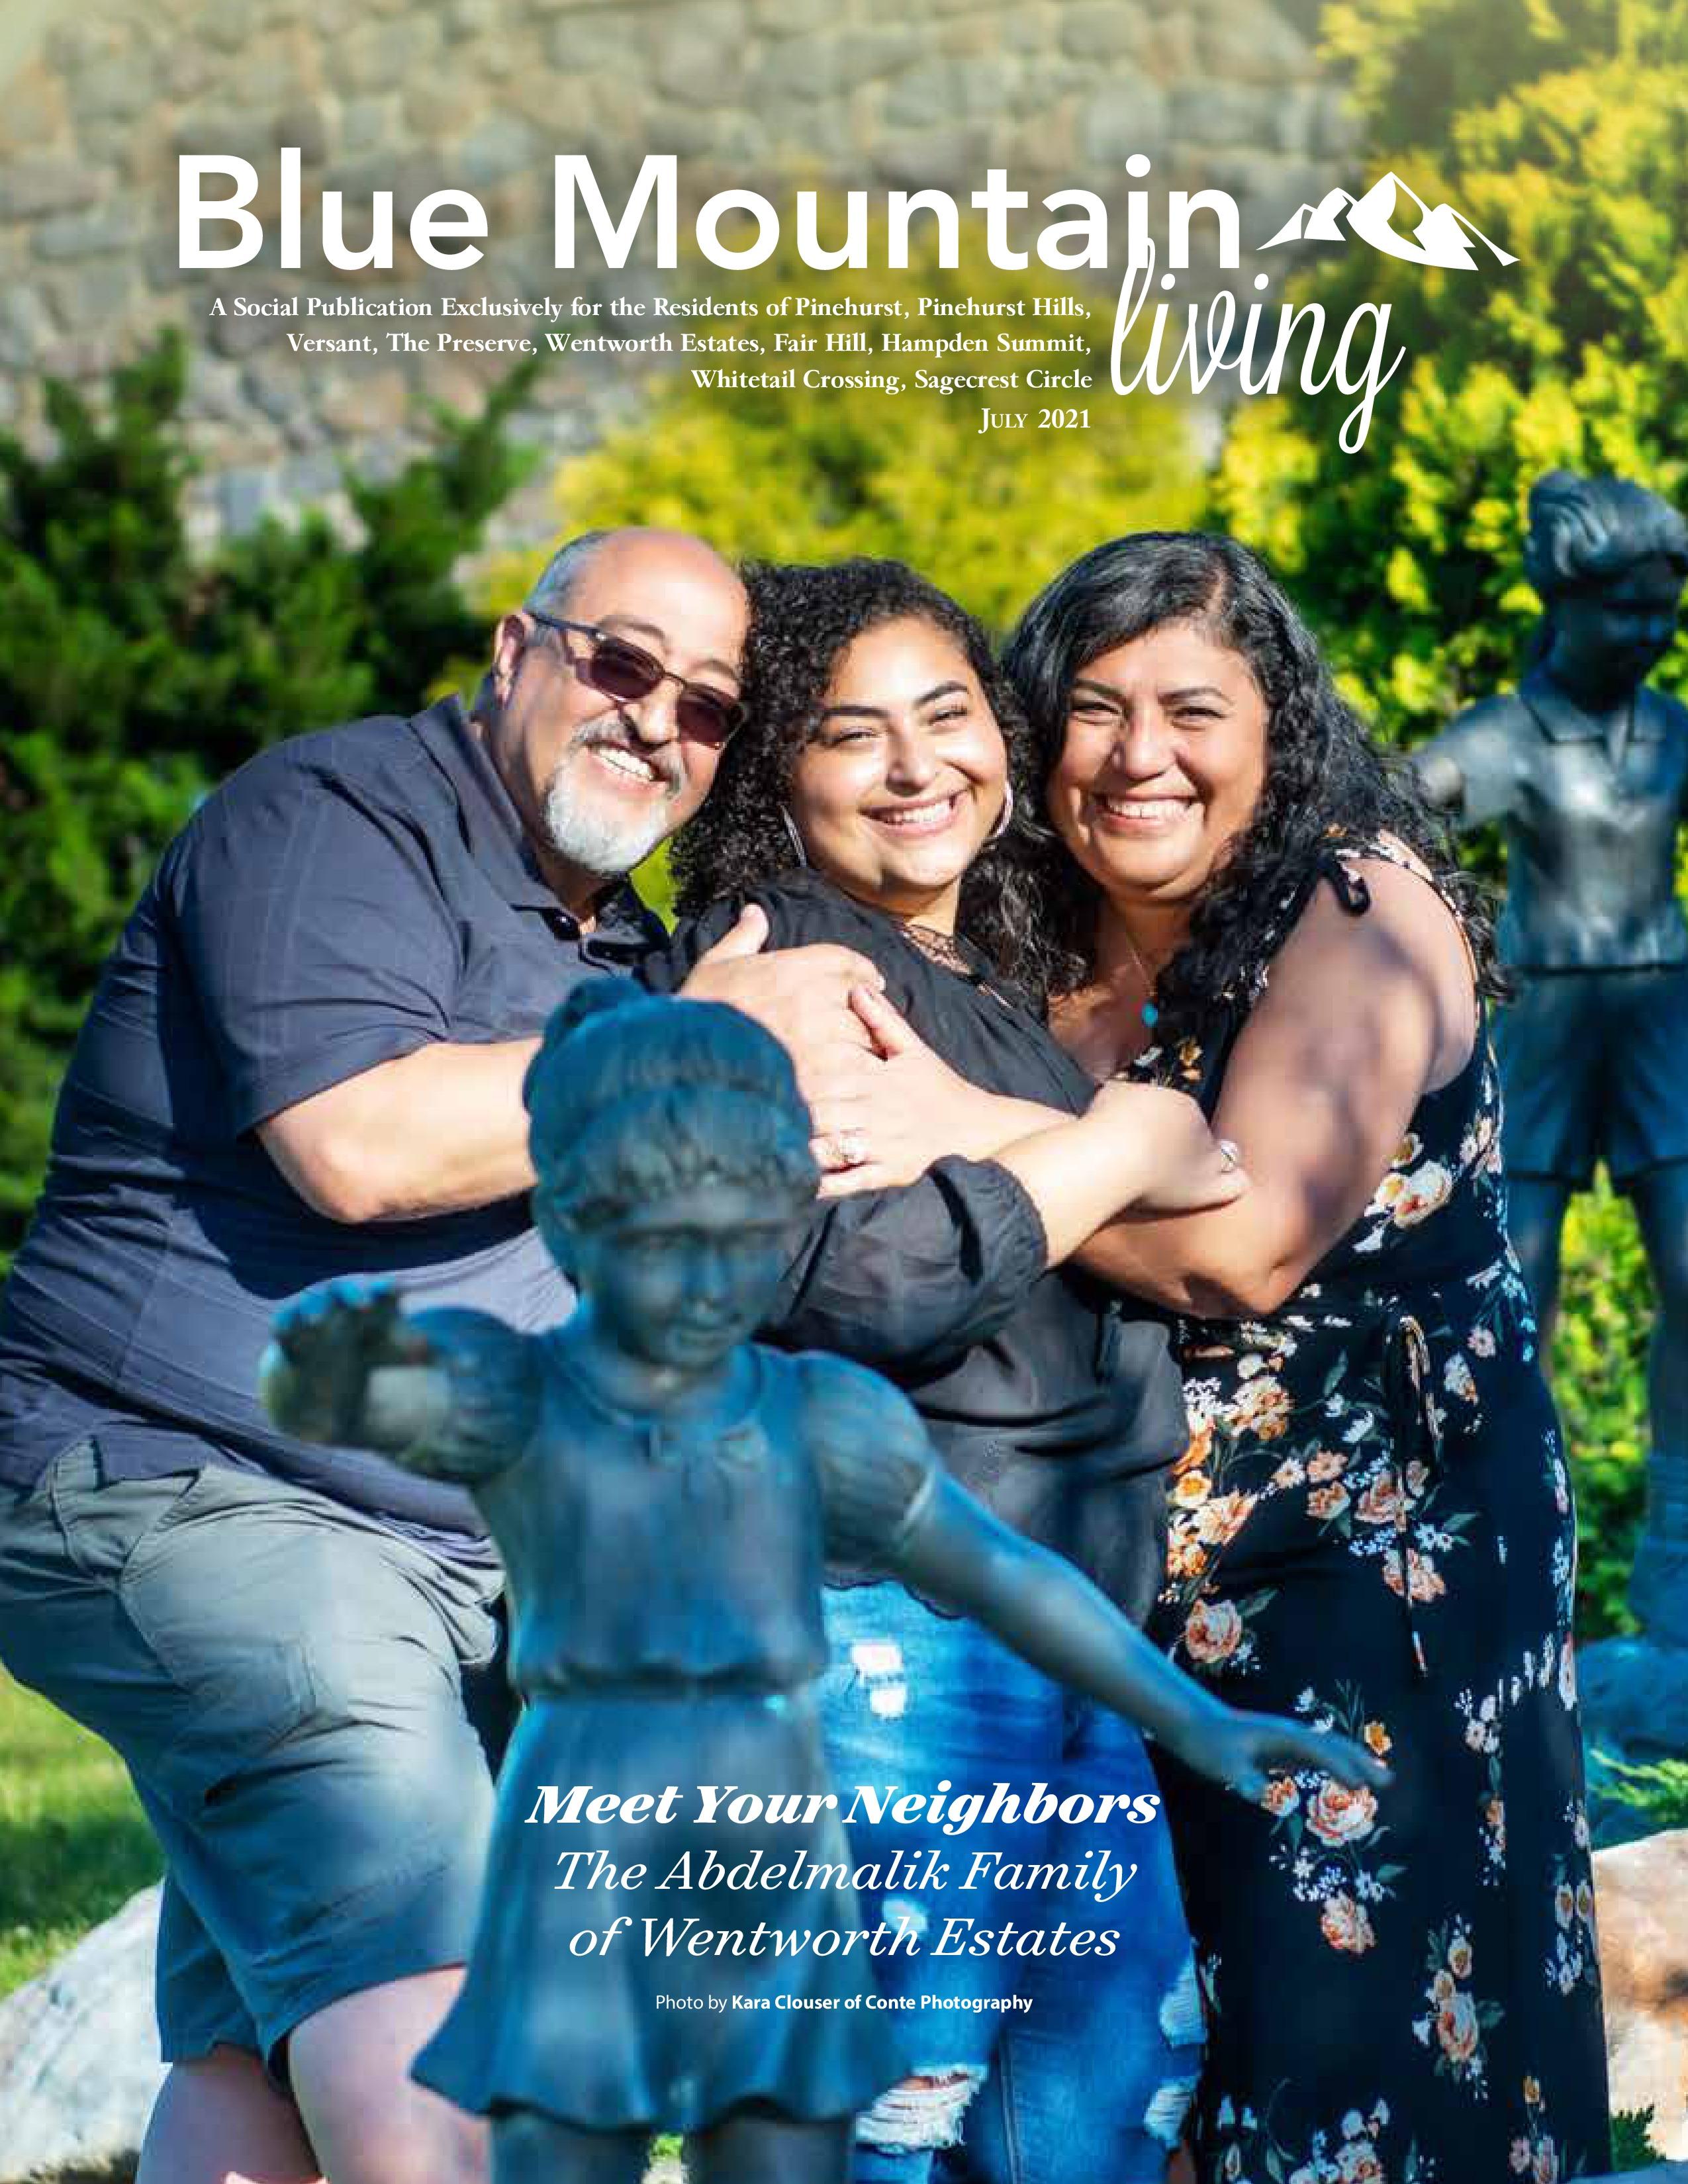 Blue Mountain Living 2021-07-01